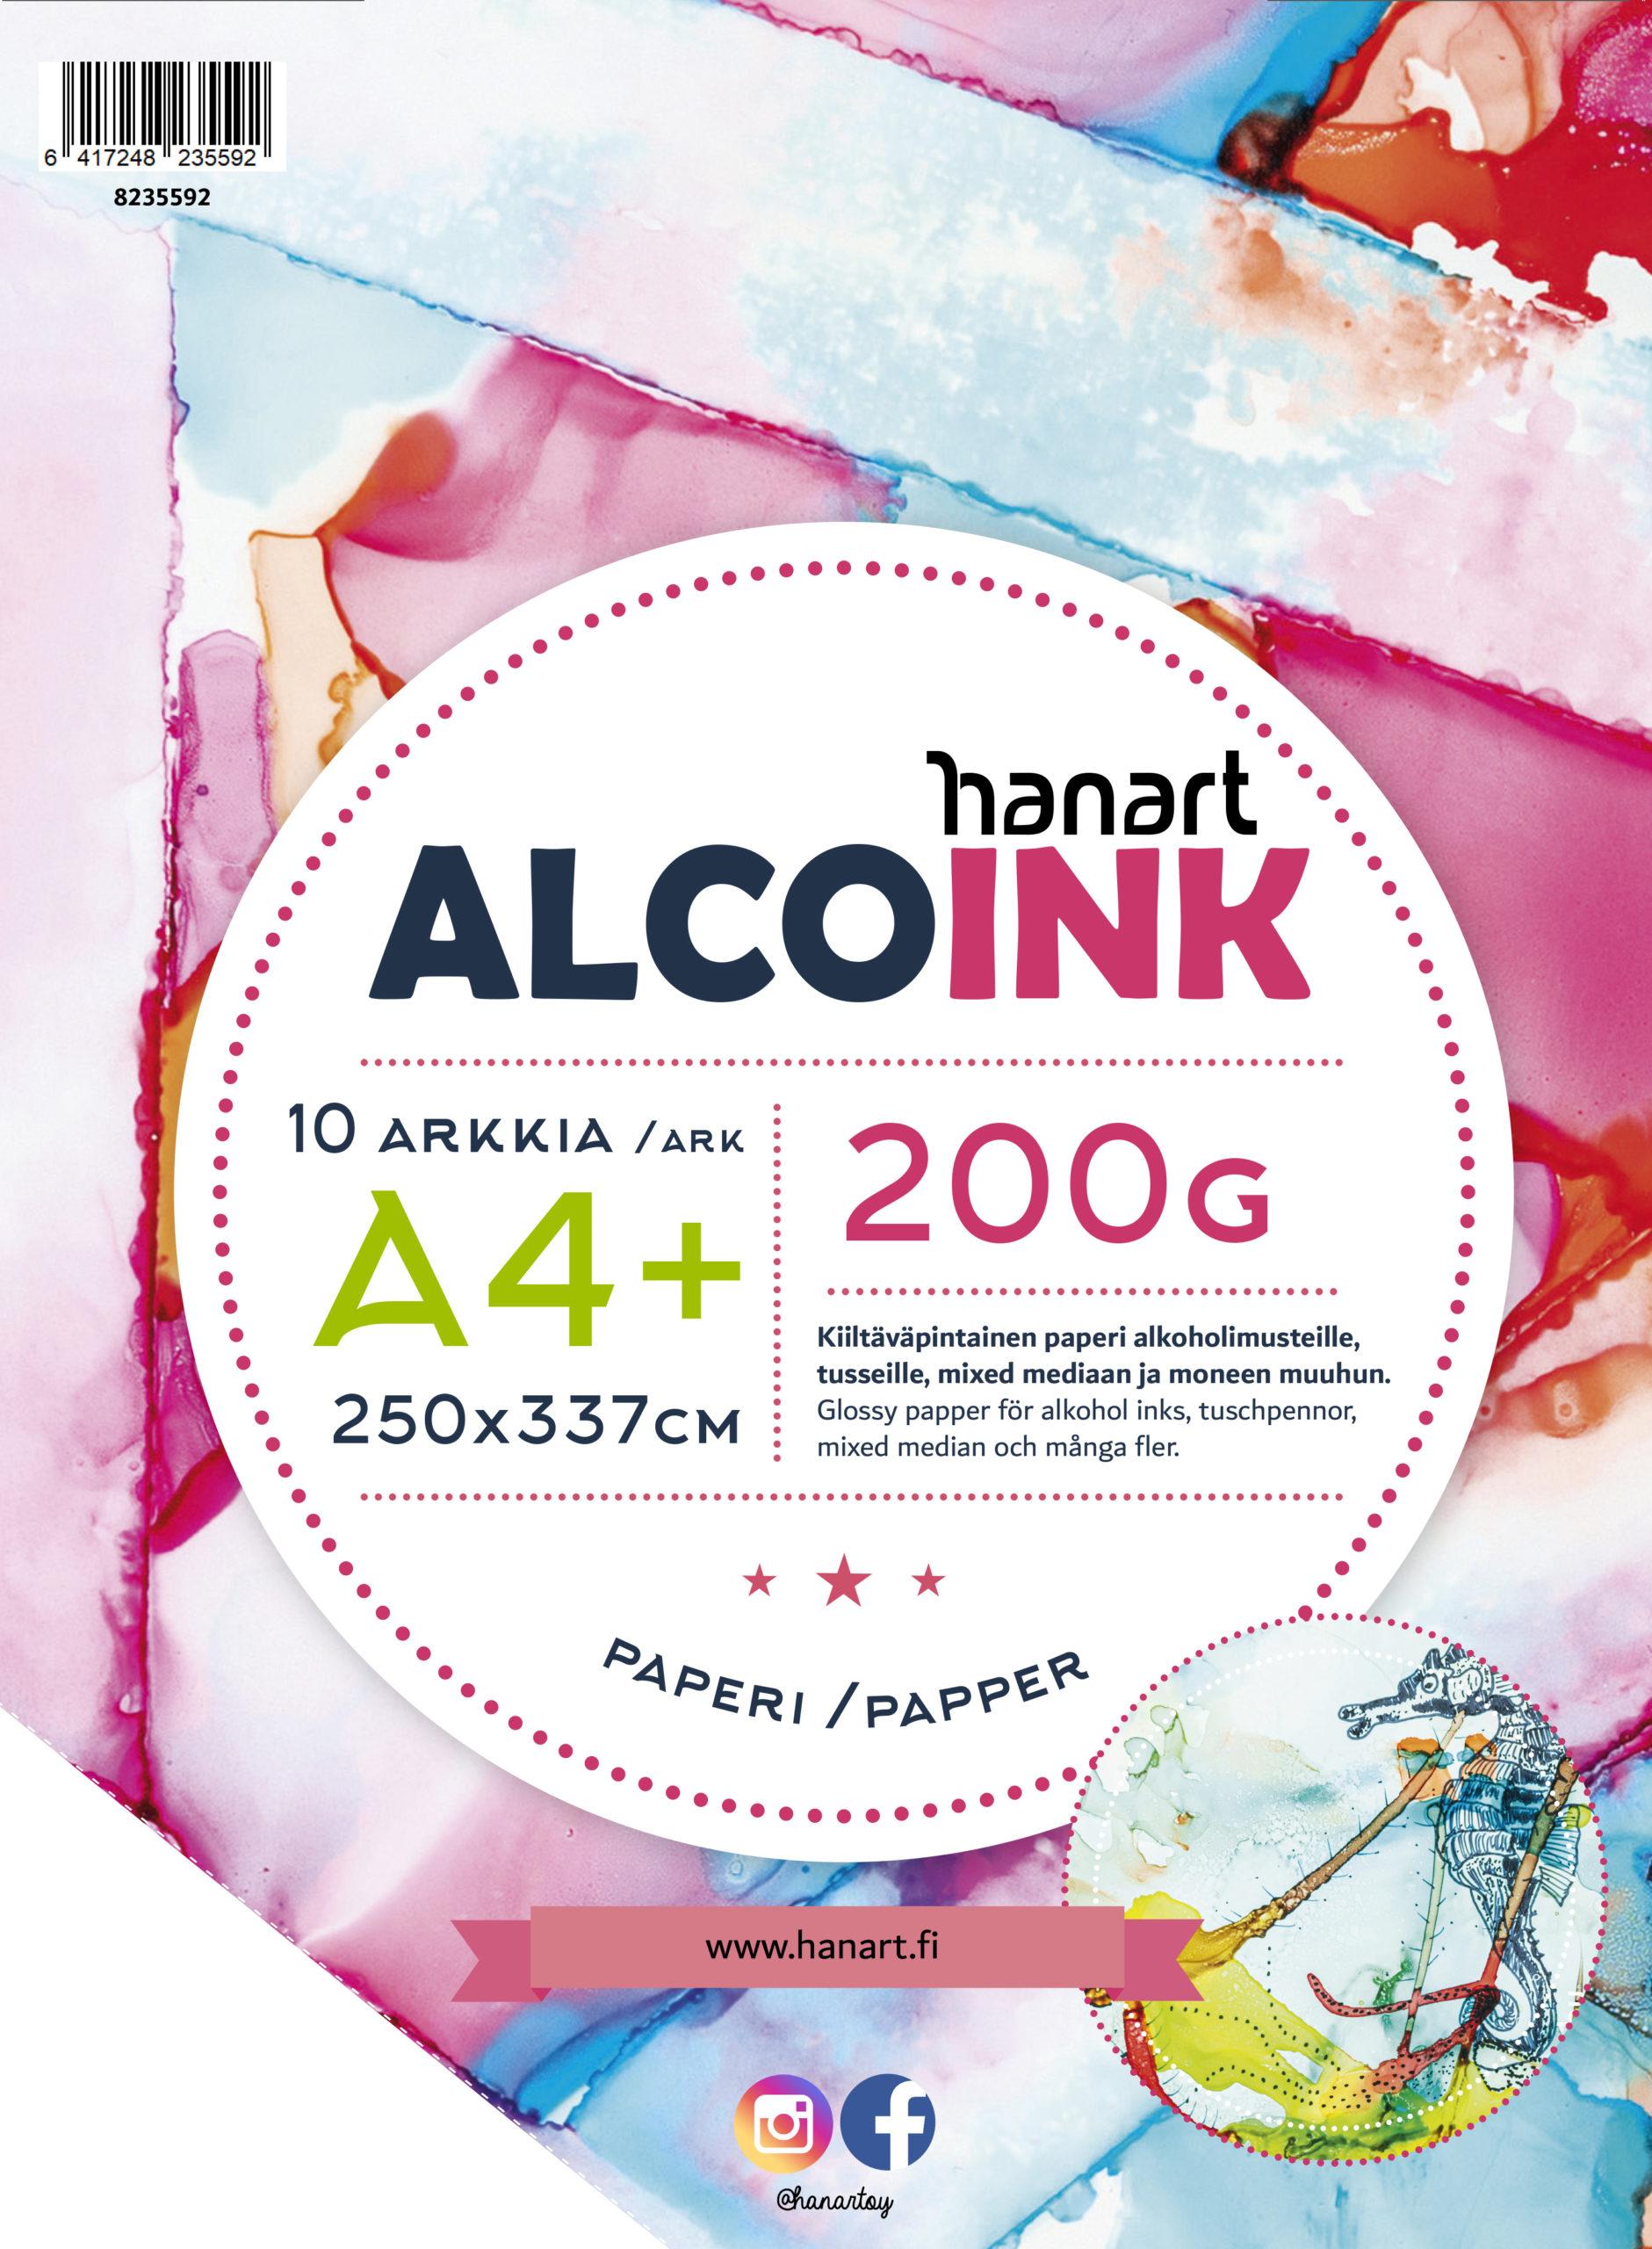 HanArt AlcoInk – paperit alkoholimusteille!